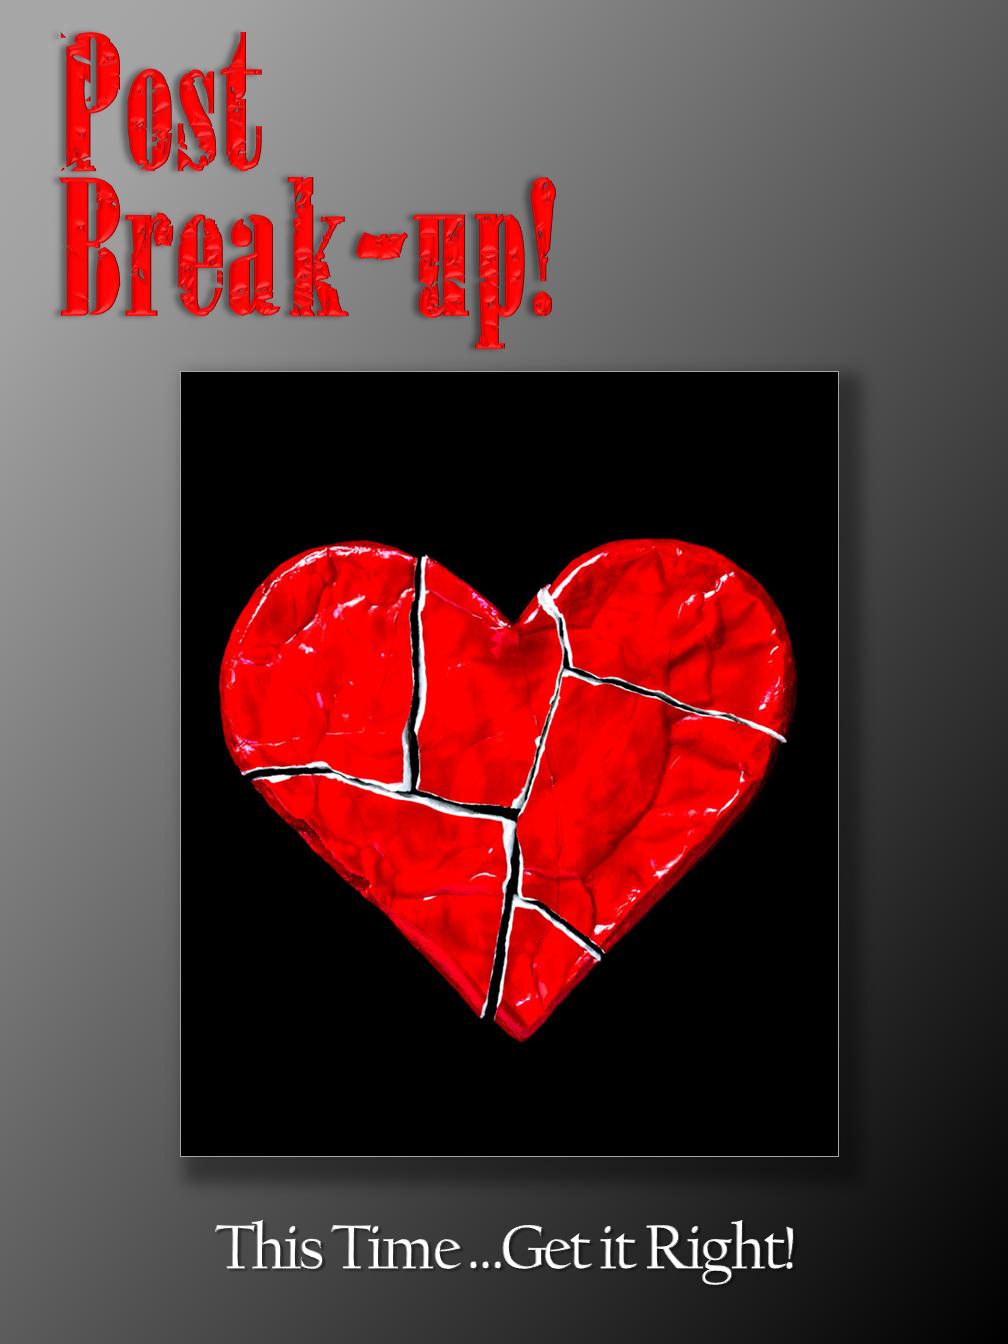 Post Break-up